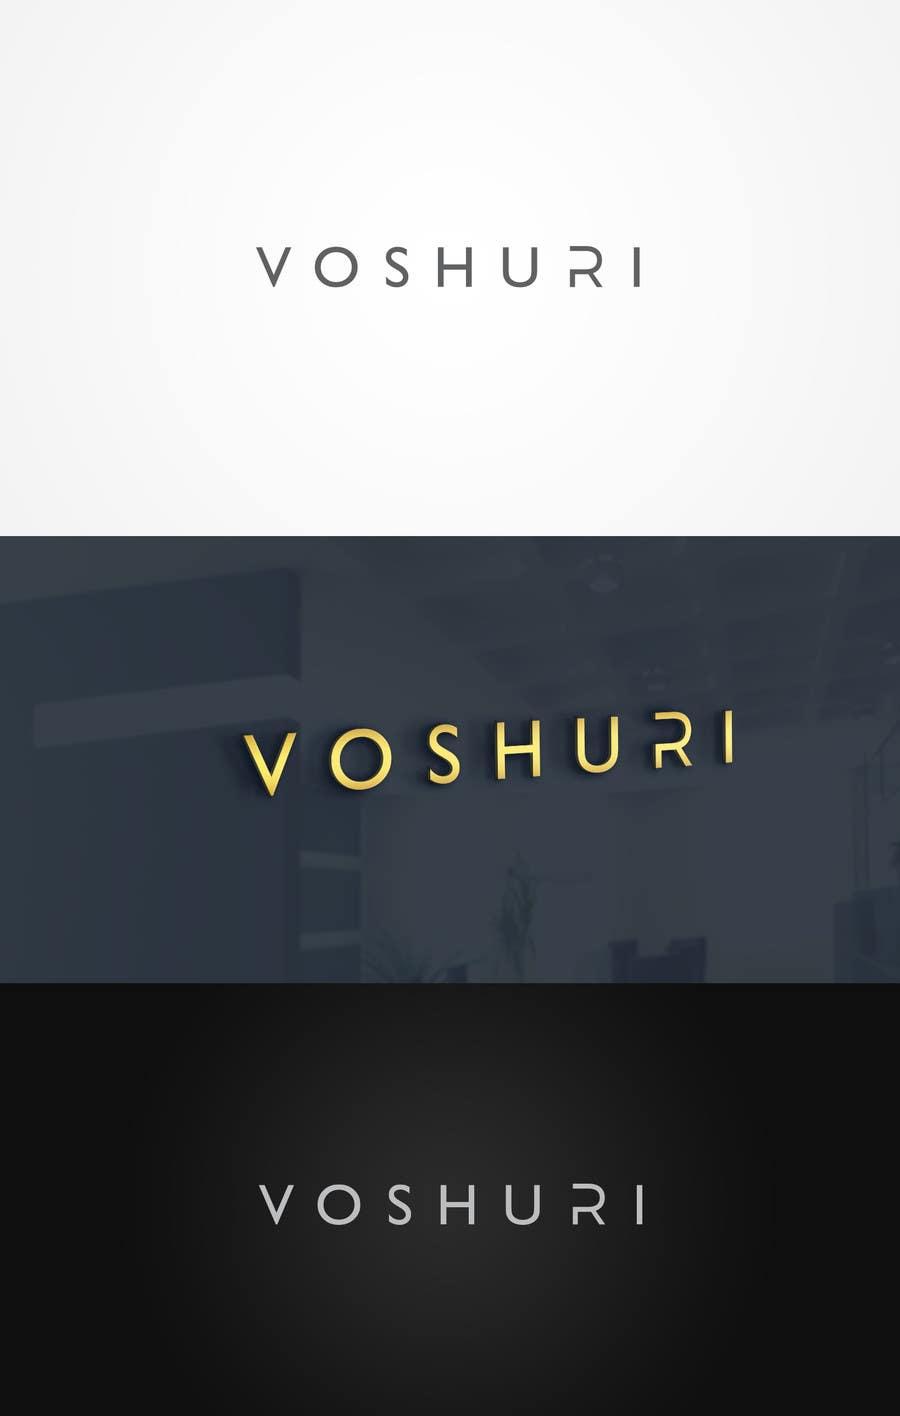 Bài tham dự cuộc thi #553 cho Design a Logo for a fashion Company